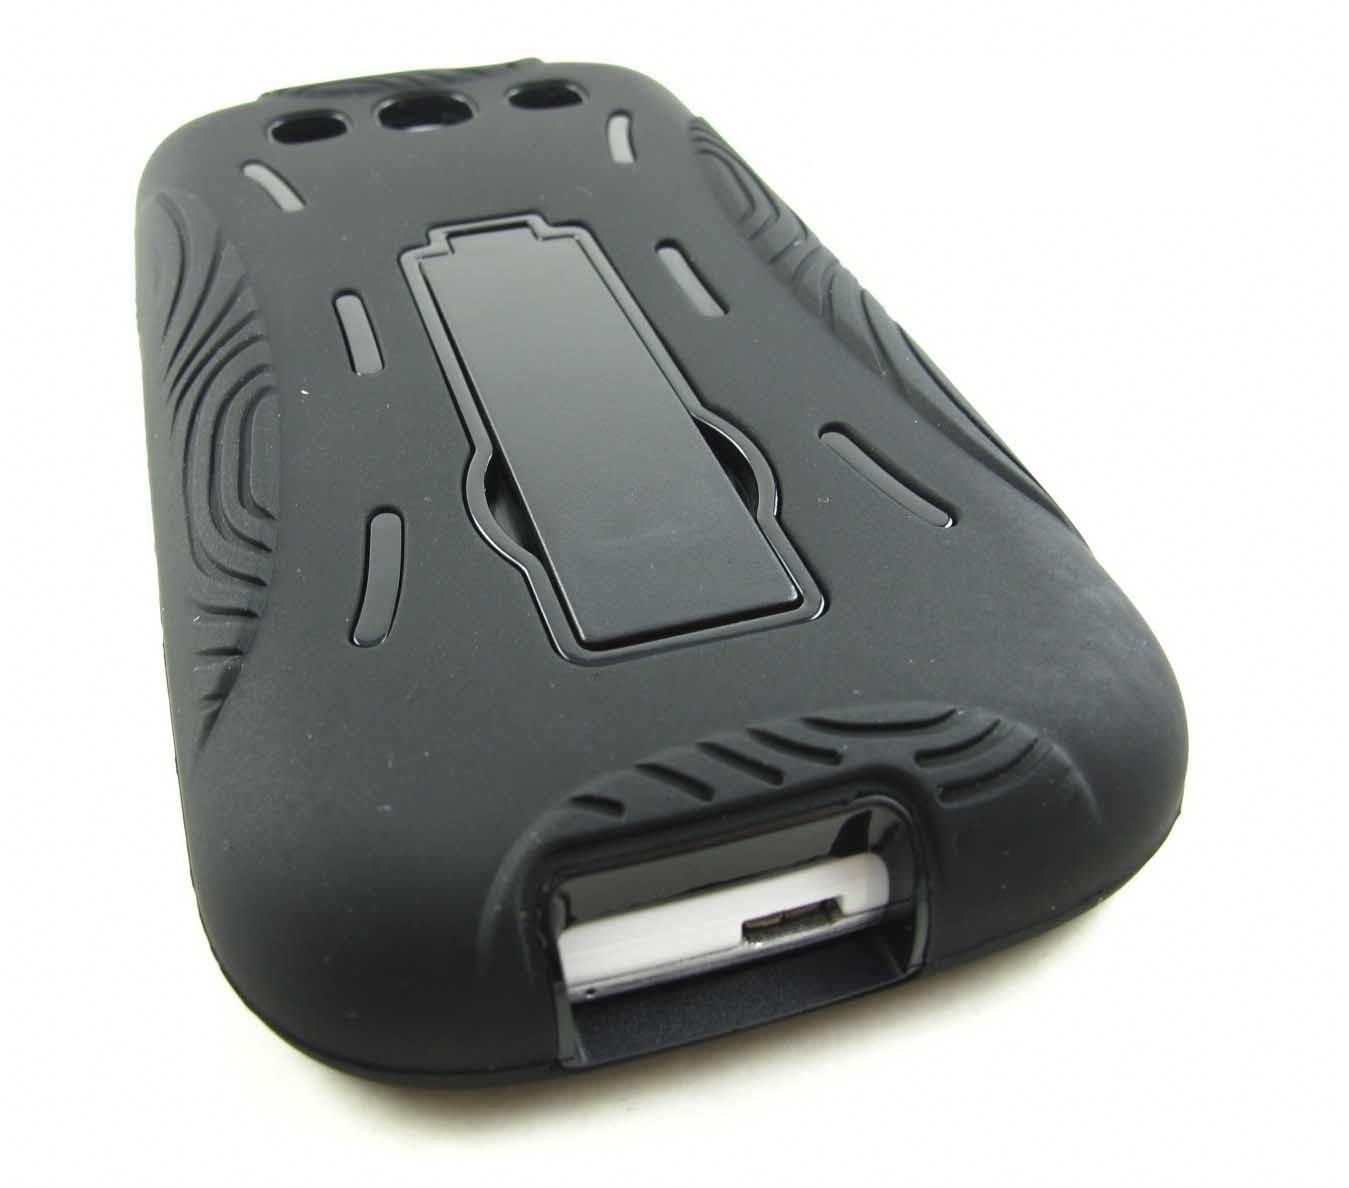 Black Bc Sturdy Hard Case Shell Cover Kickstand Samsung Galaxy S 3 S3